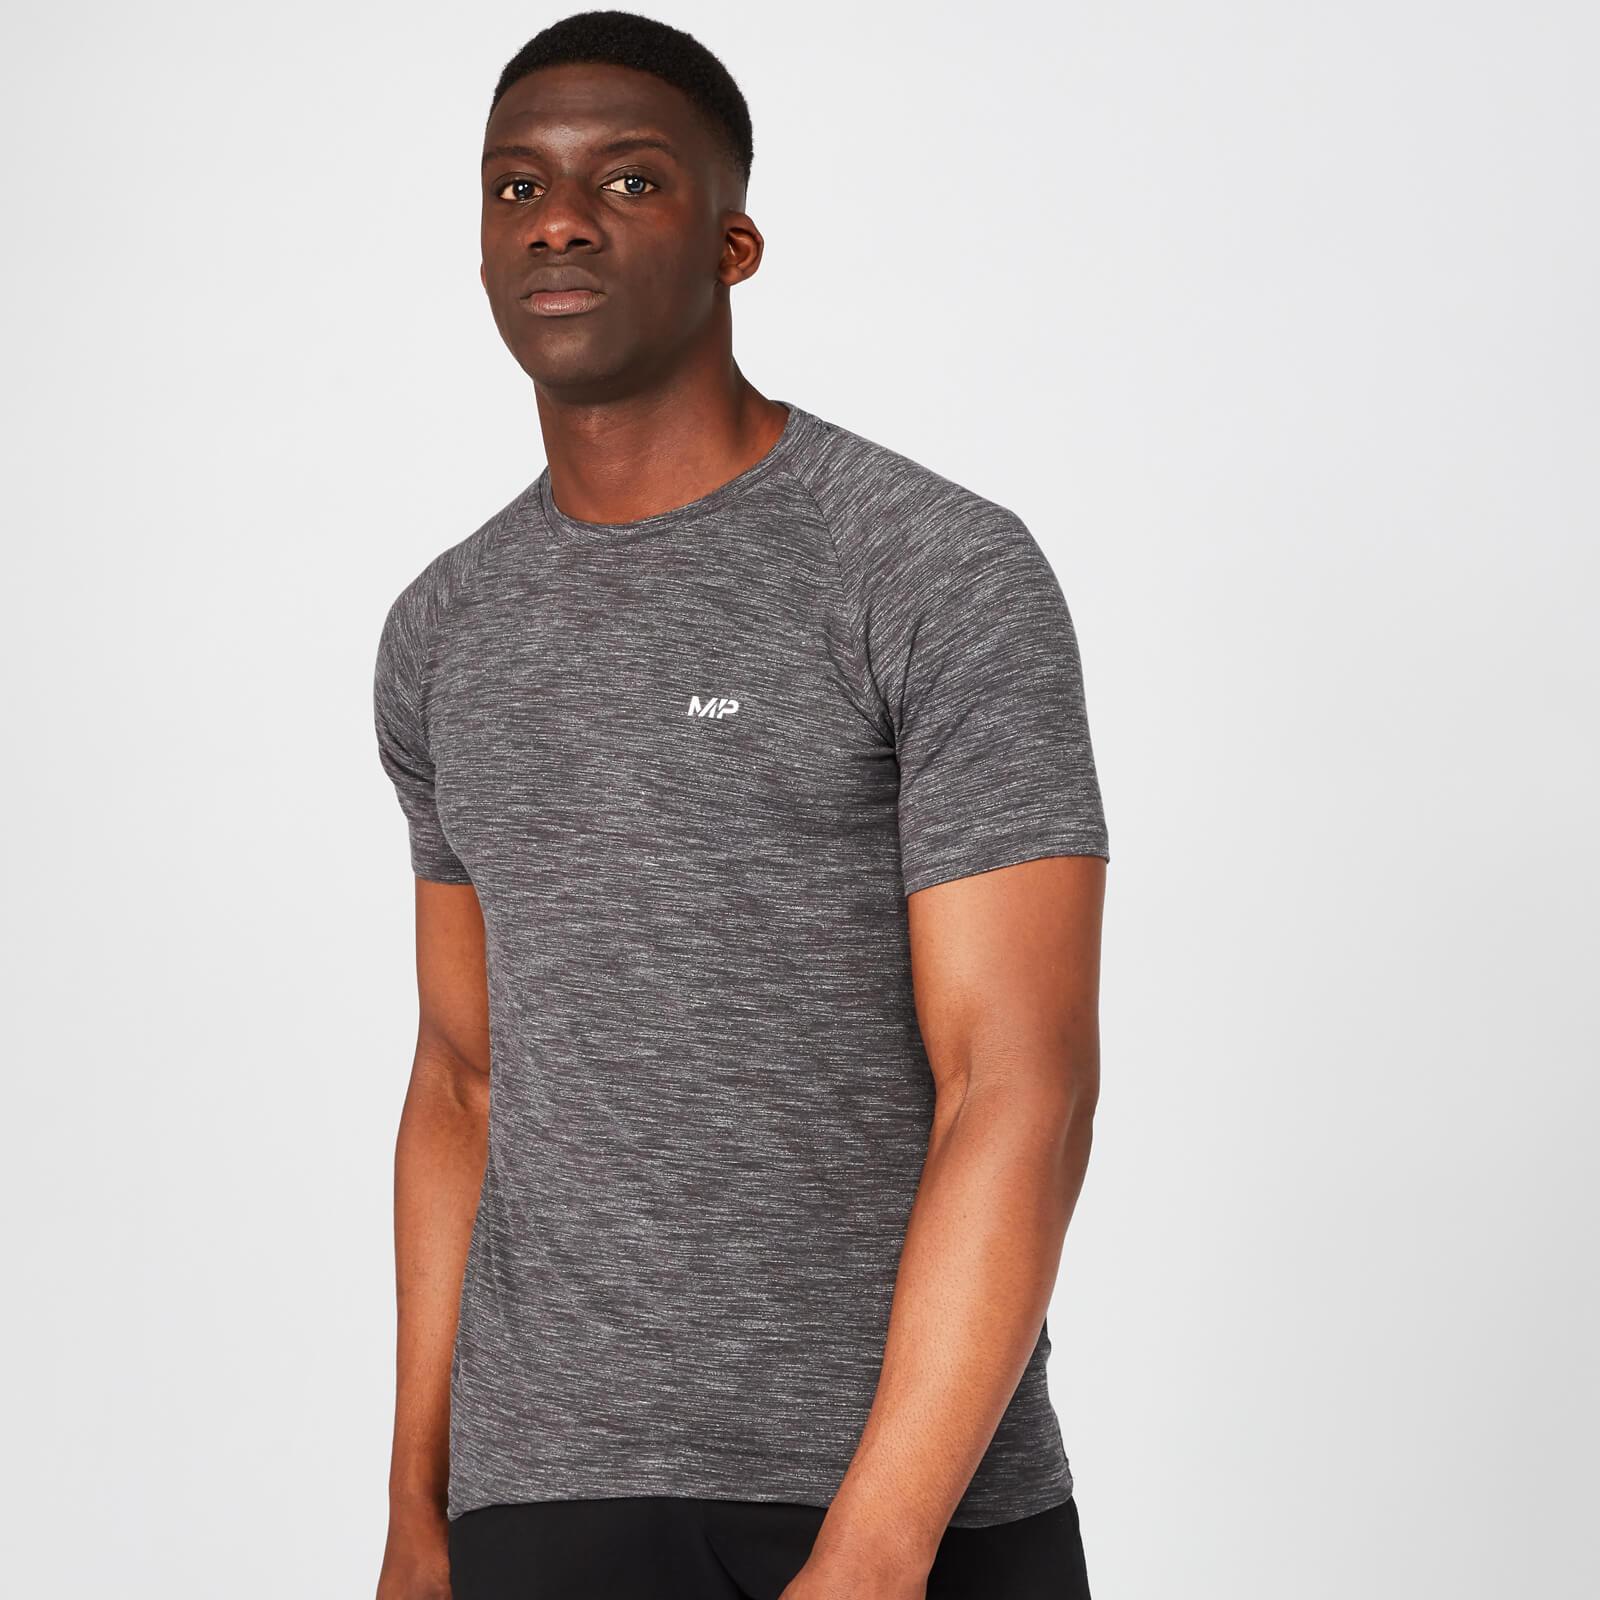 Myprotein Performance T-Shirt - Black Marl - XL